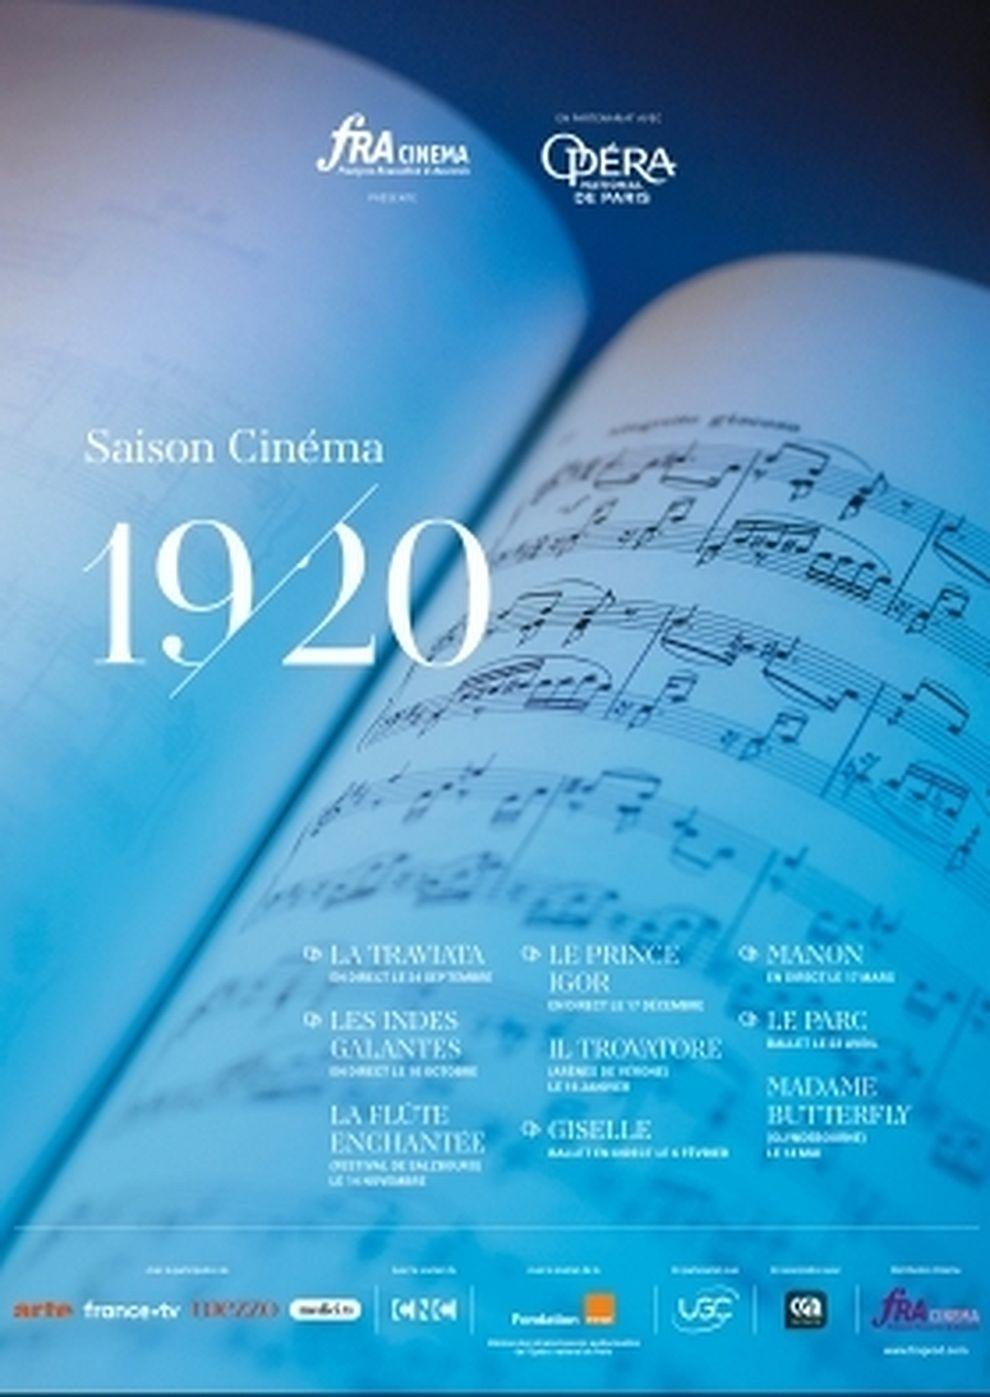 Opéra national de Paris 2019/20: La Traviata (Verdi) (Poster)